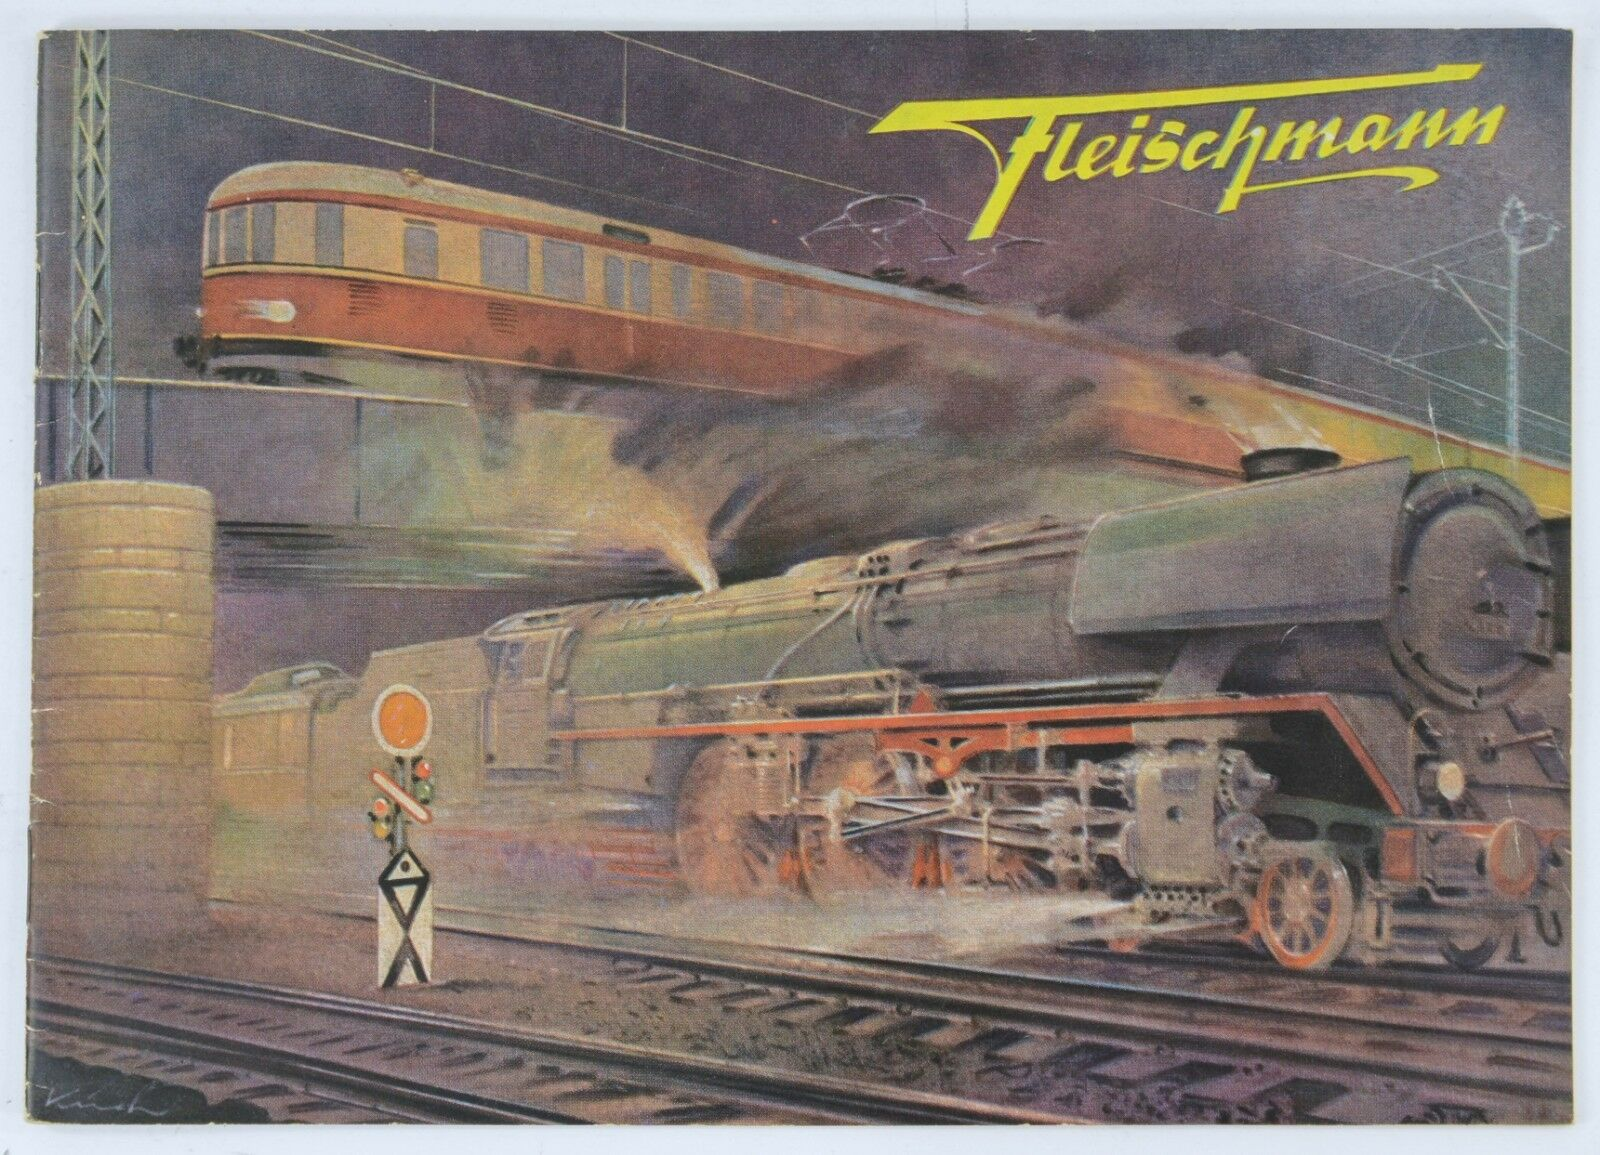 FLEISCHMANN 1952 20 PAGE CATALOGUE IN GERMAN PLUS FLIER & PRICE LIST NEAR MINT